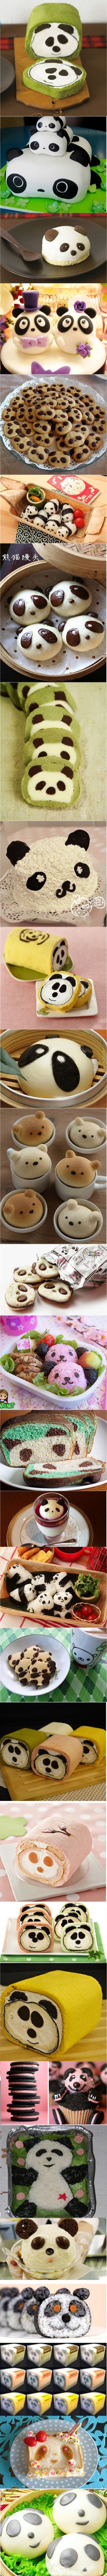 Panda desserts! I want them all.